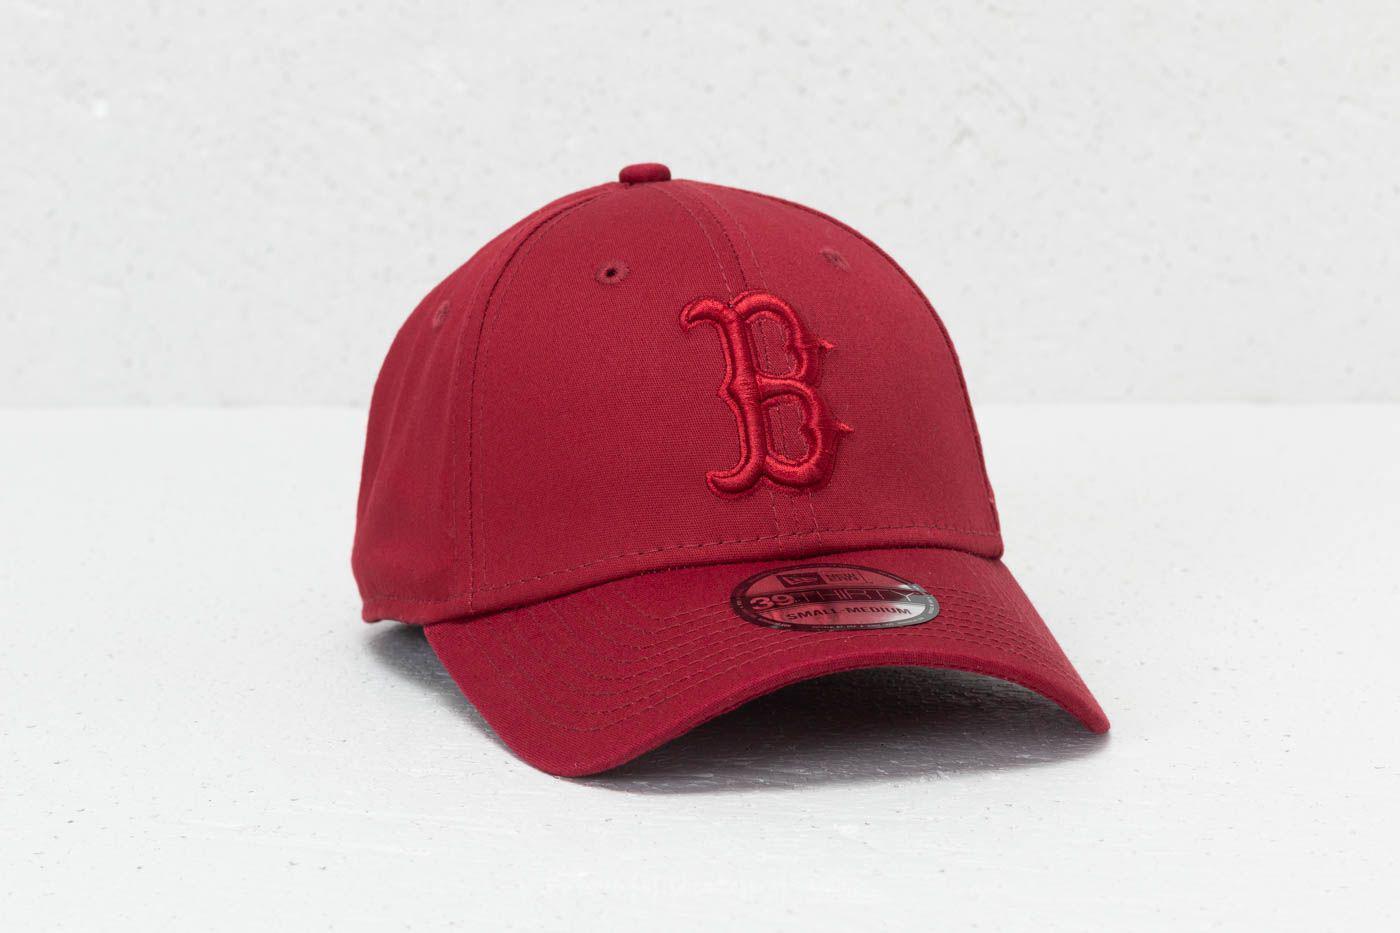 Lyst - Ktz 39thirty Mlb League Essential Boston Red Sox Cap Cardinal ... cd488aa04c19